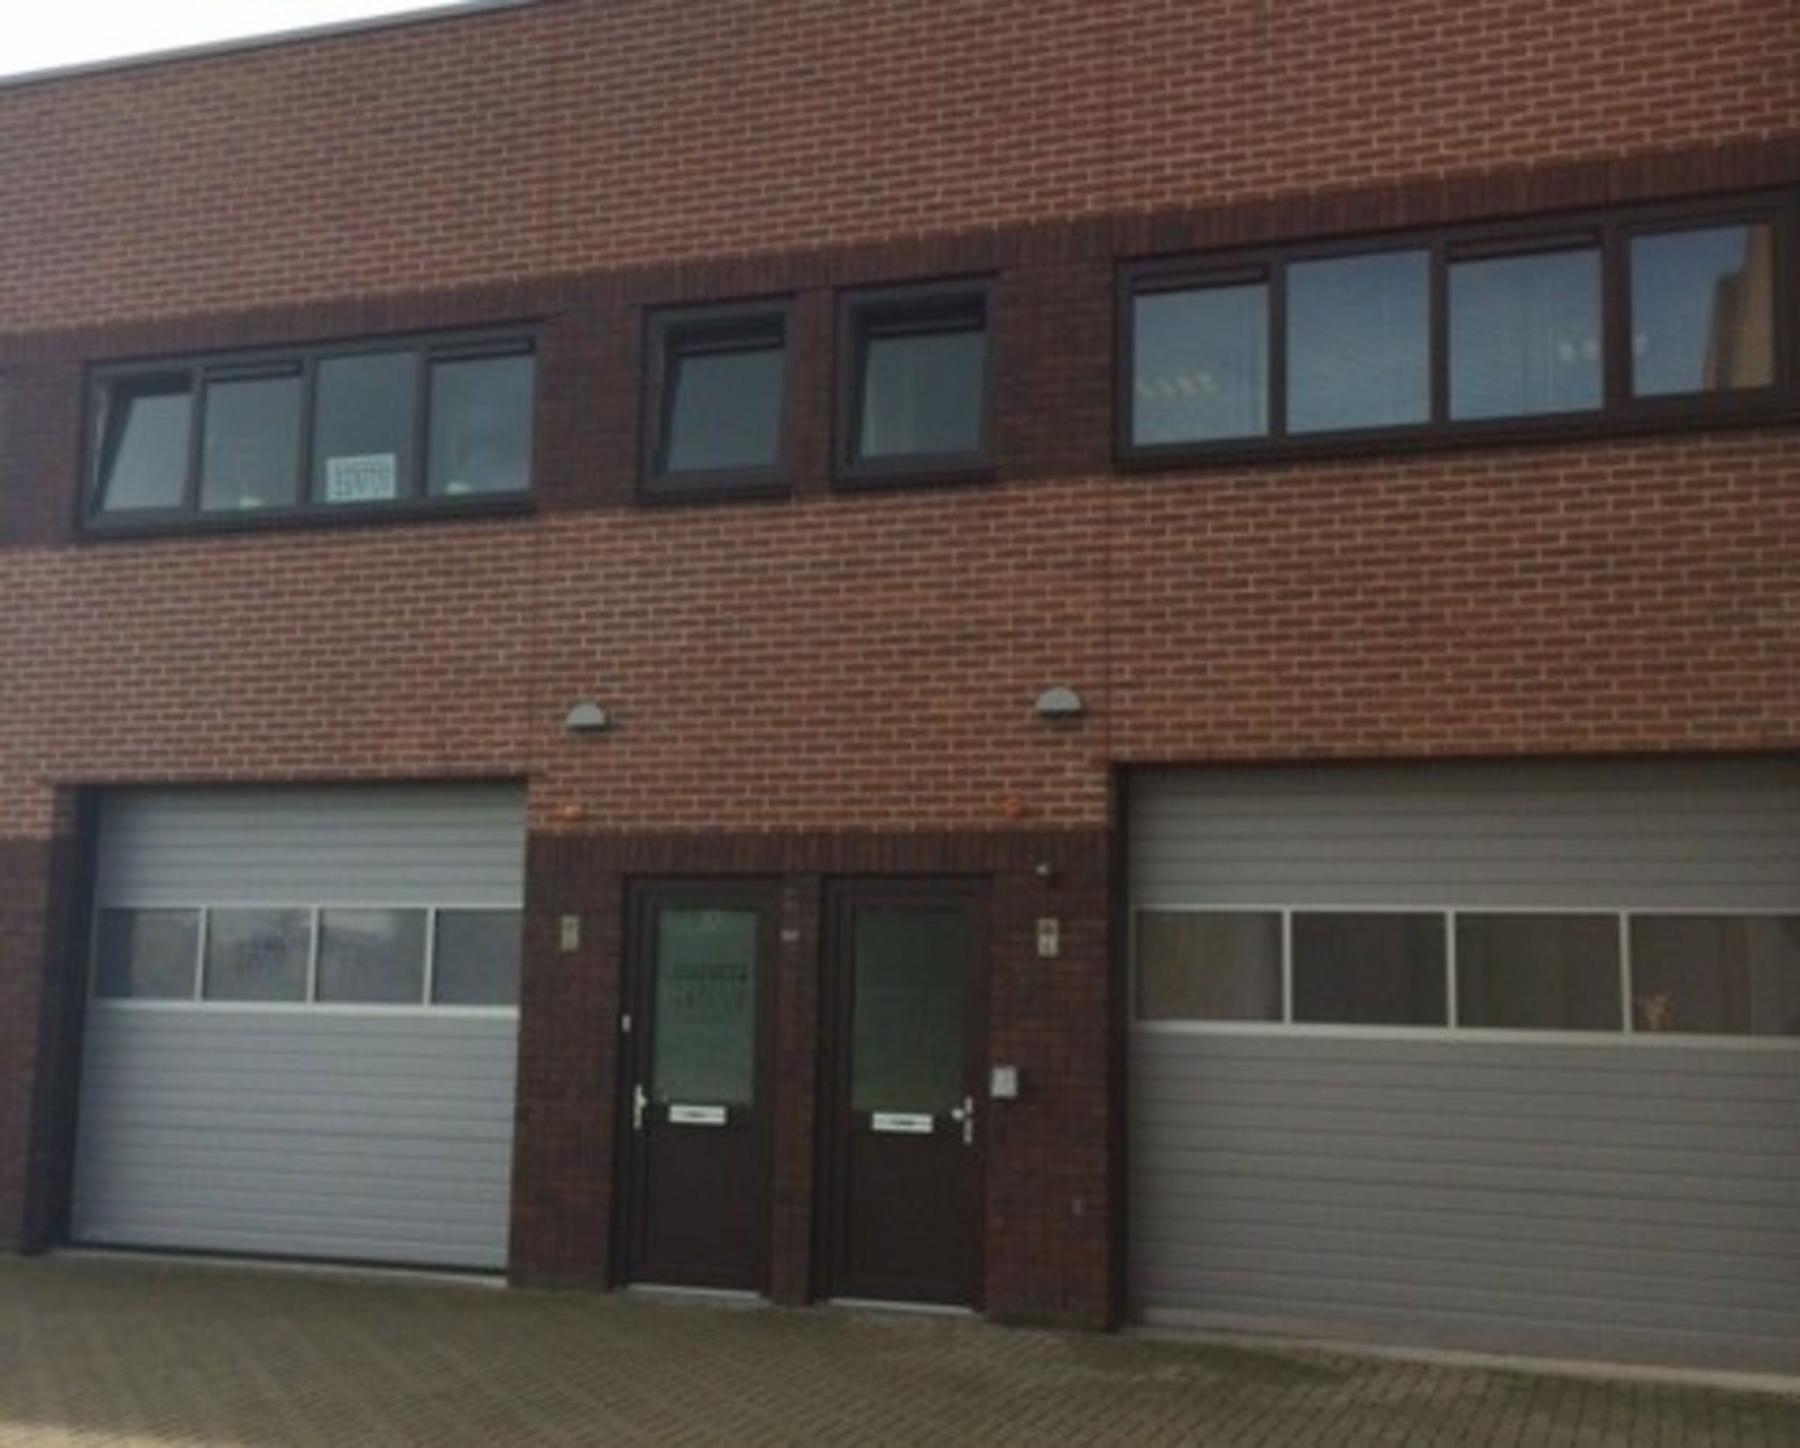 Salomonstraat 6 - Alkmaar